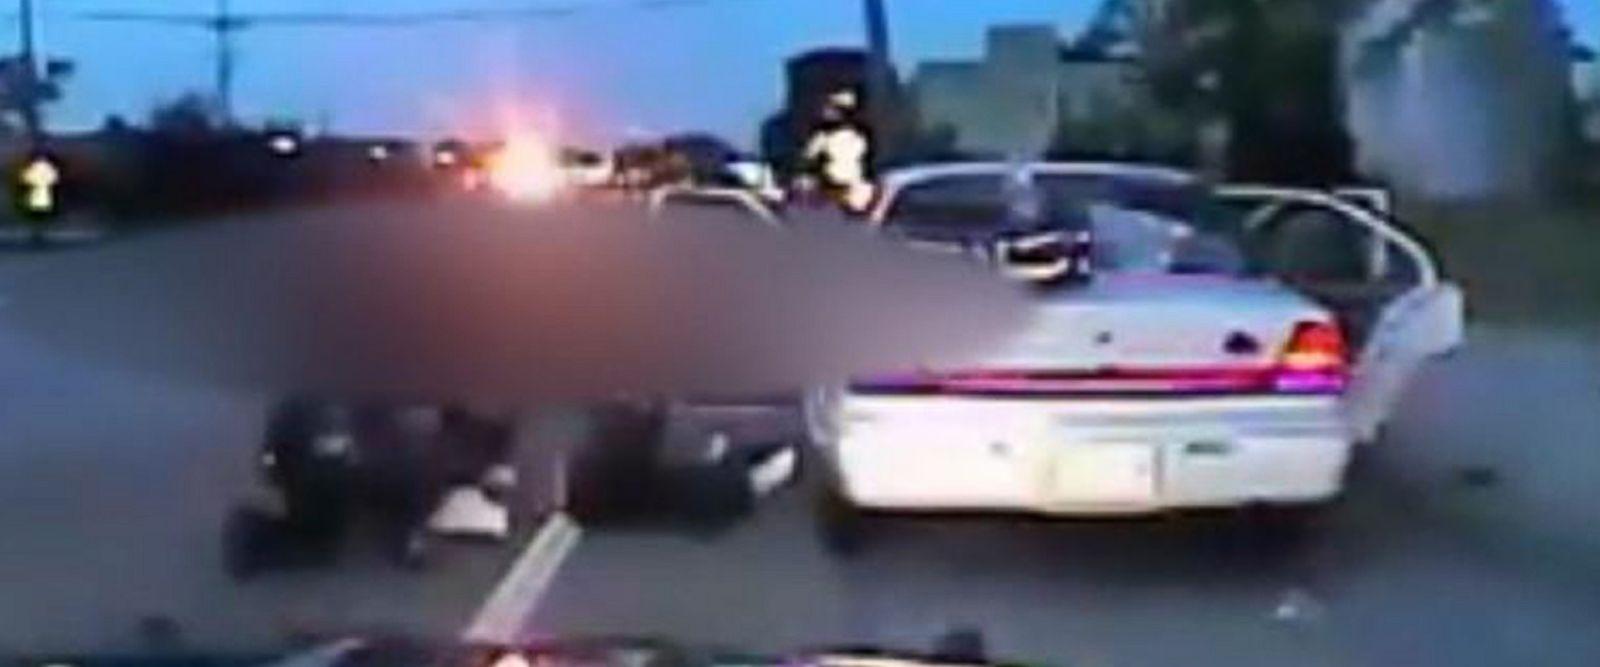 VIDEO: Philandro Castile death: Police dashcam video released